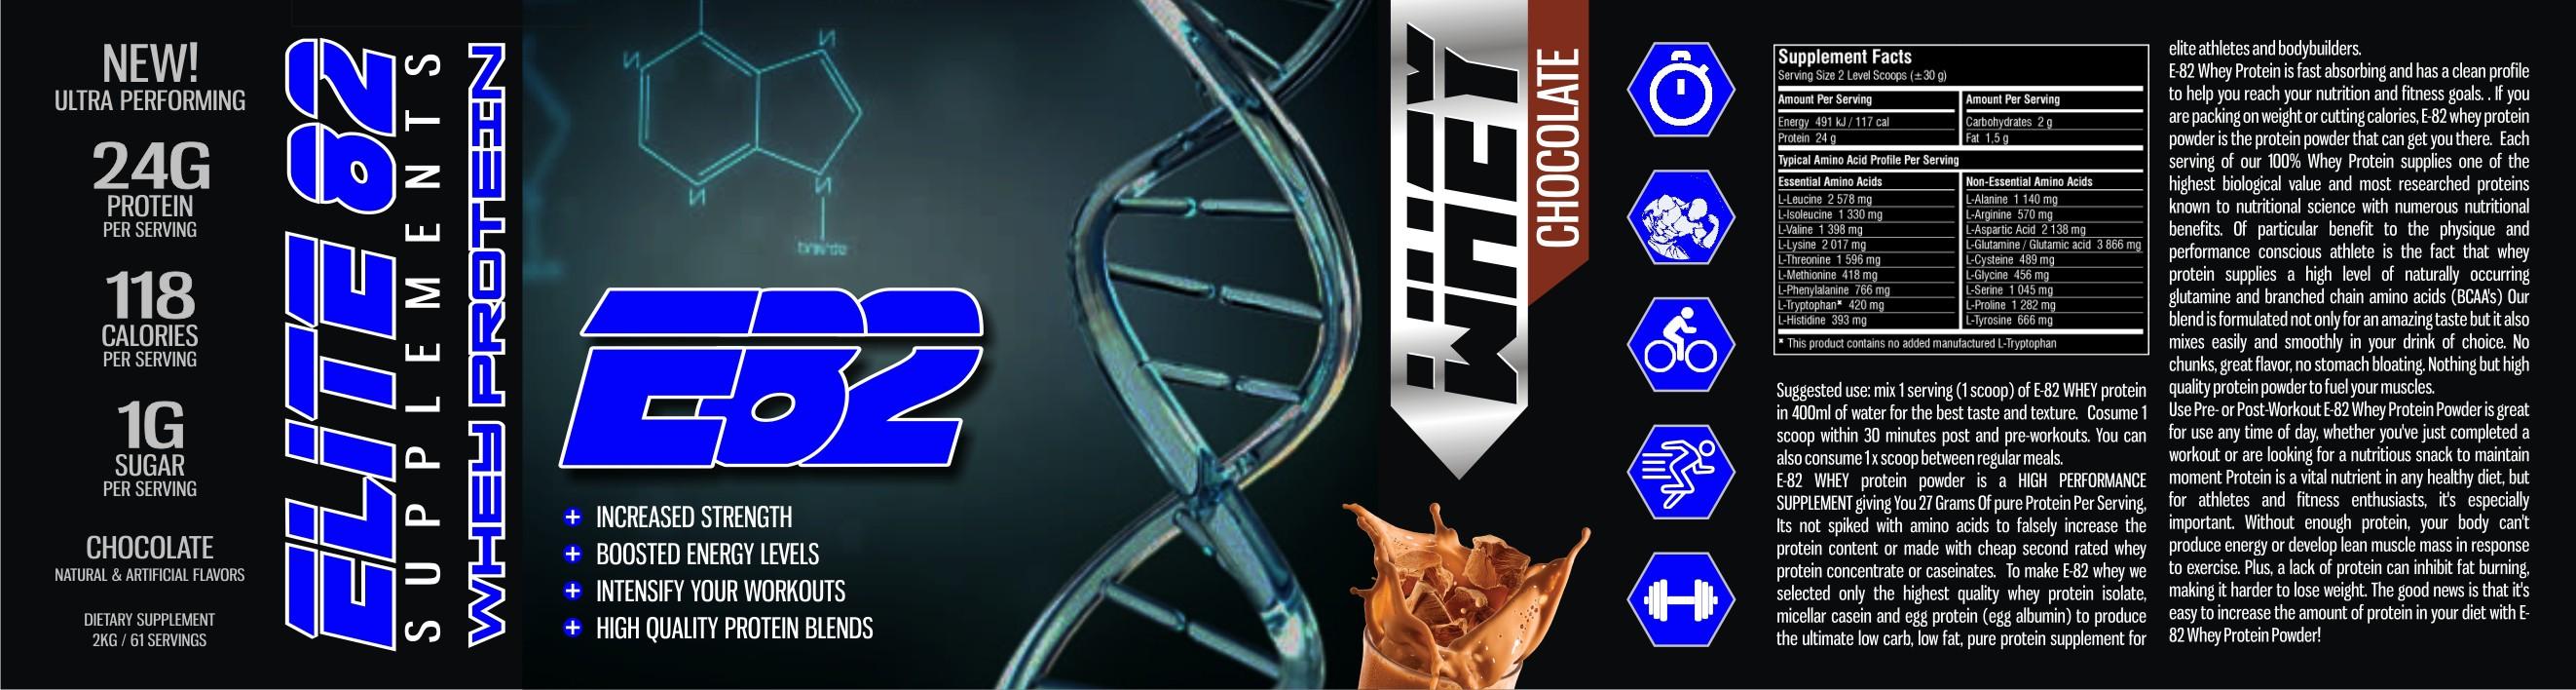 elite-82 protein label